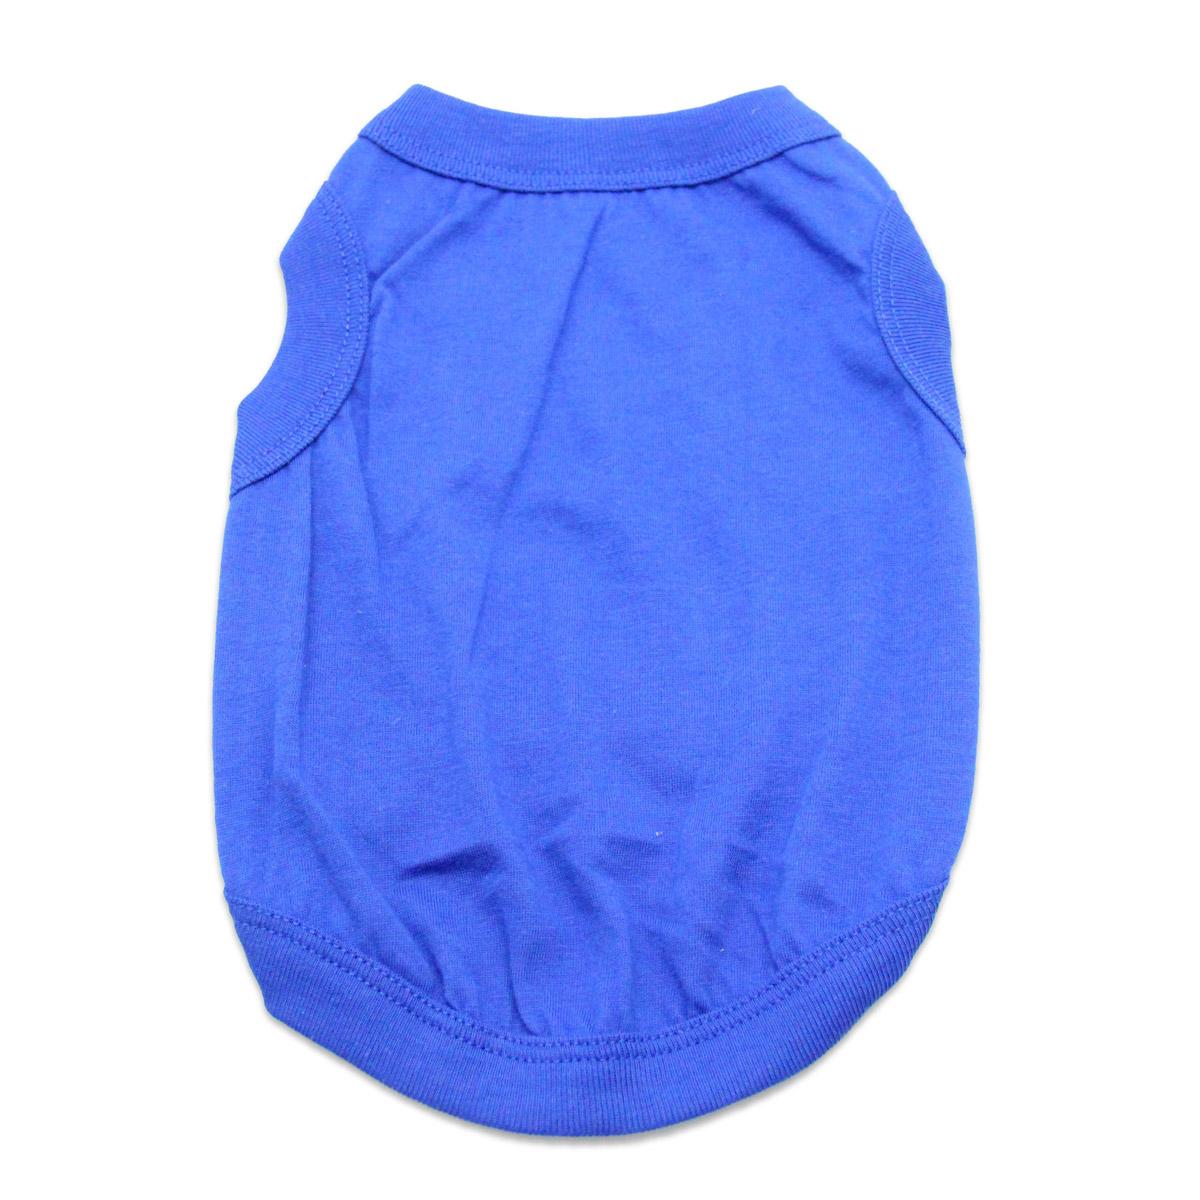 Barking Basics Dog Tank Shirt - Blue